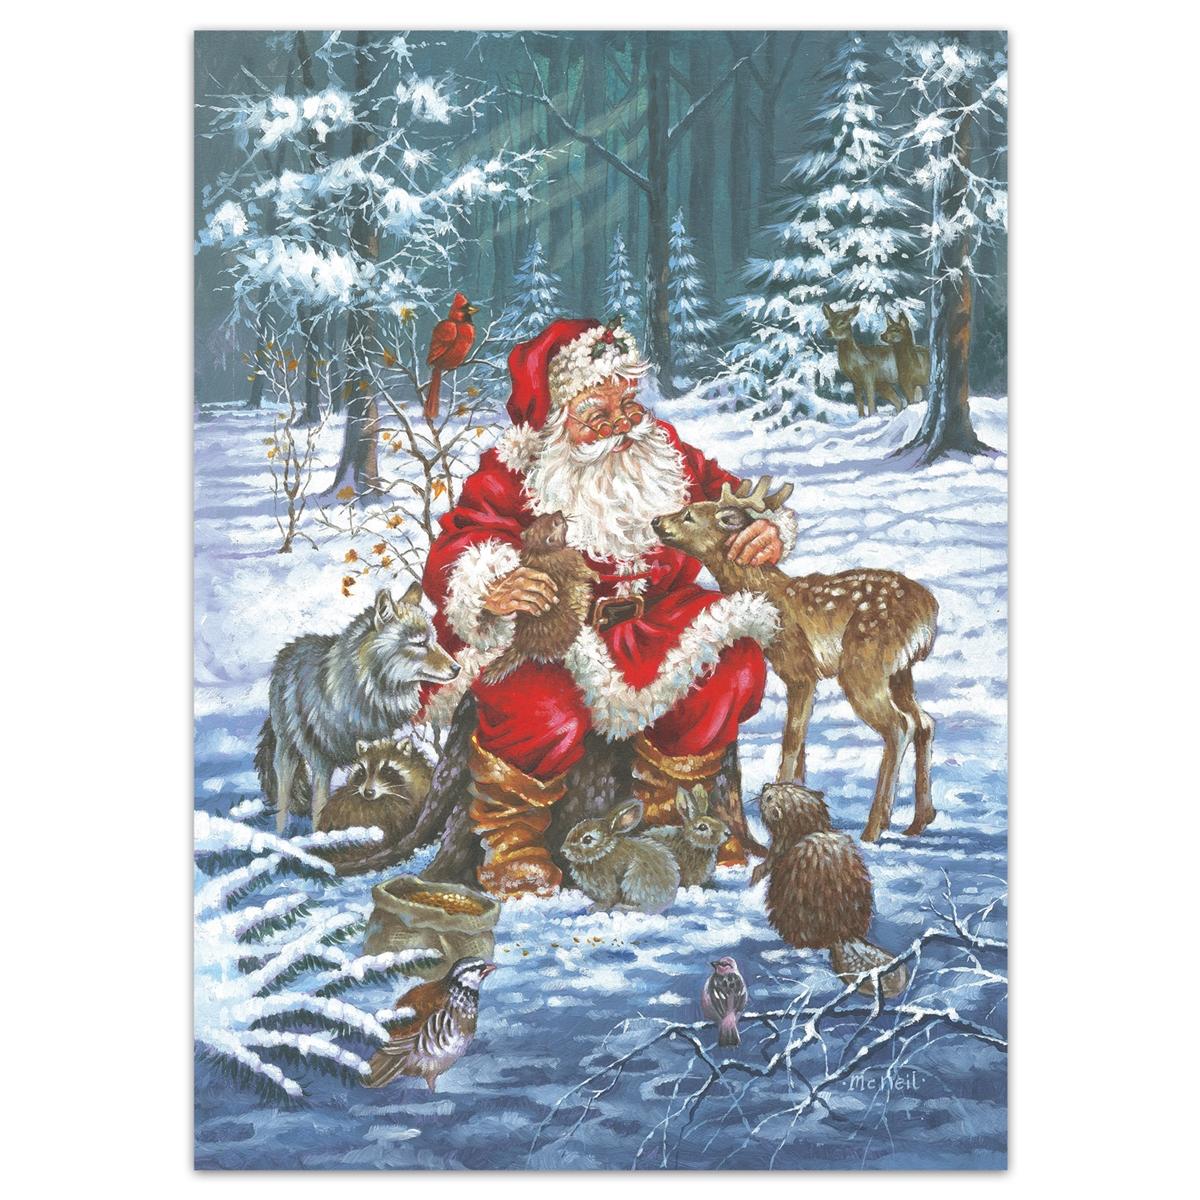 National Wildlife Christmas Cards 2021 Wildlife Santa Holiday Cards The National Wildlife Federation